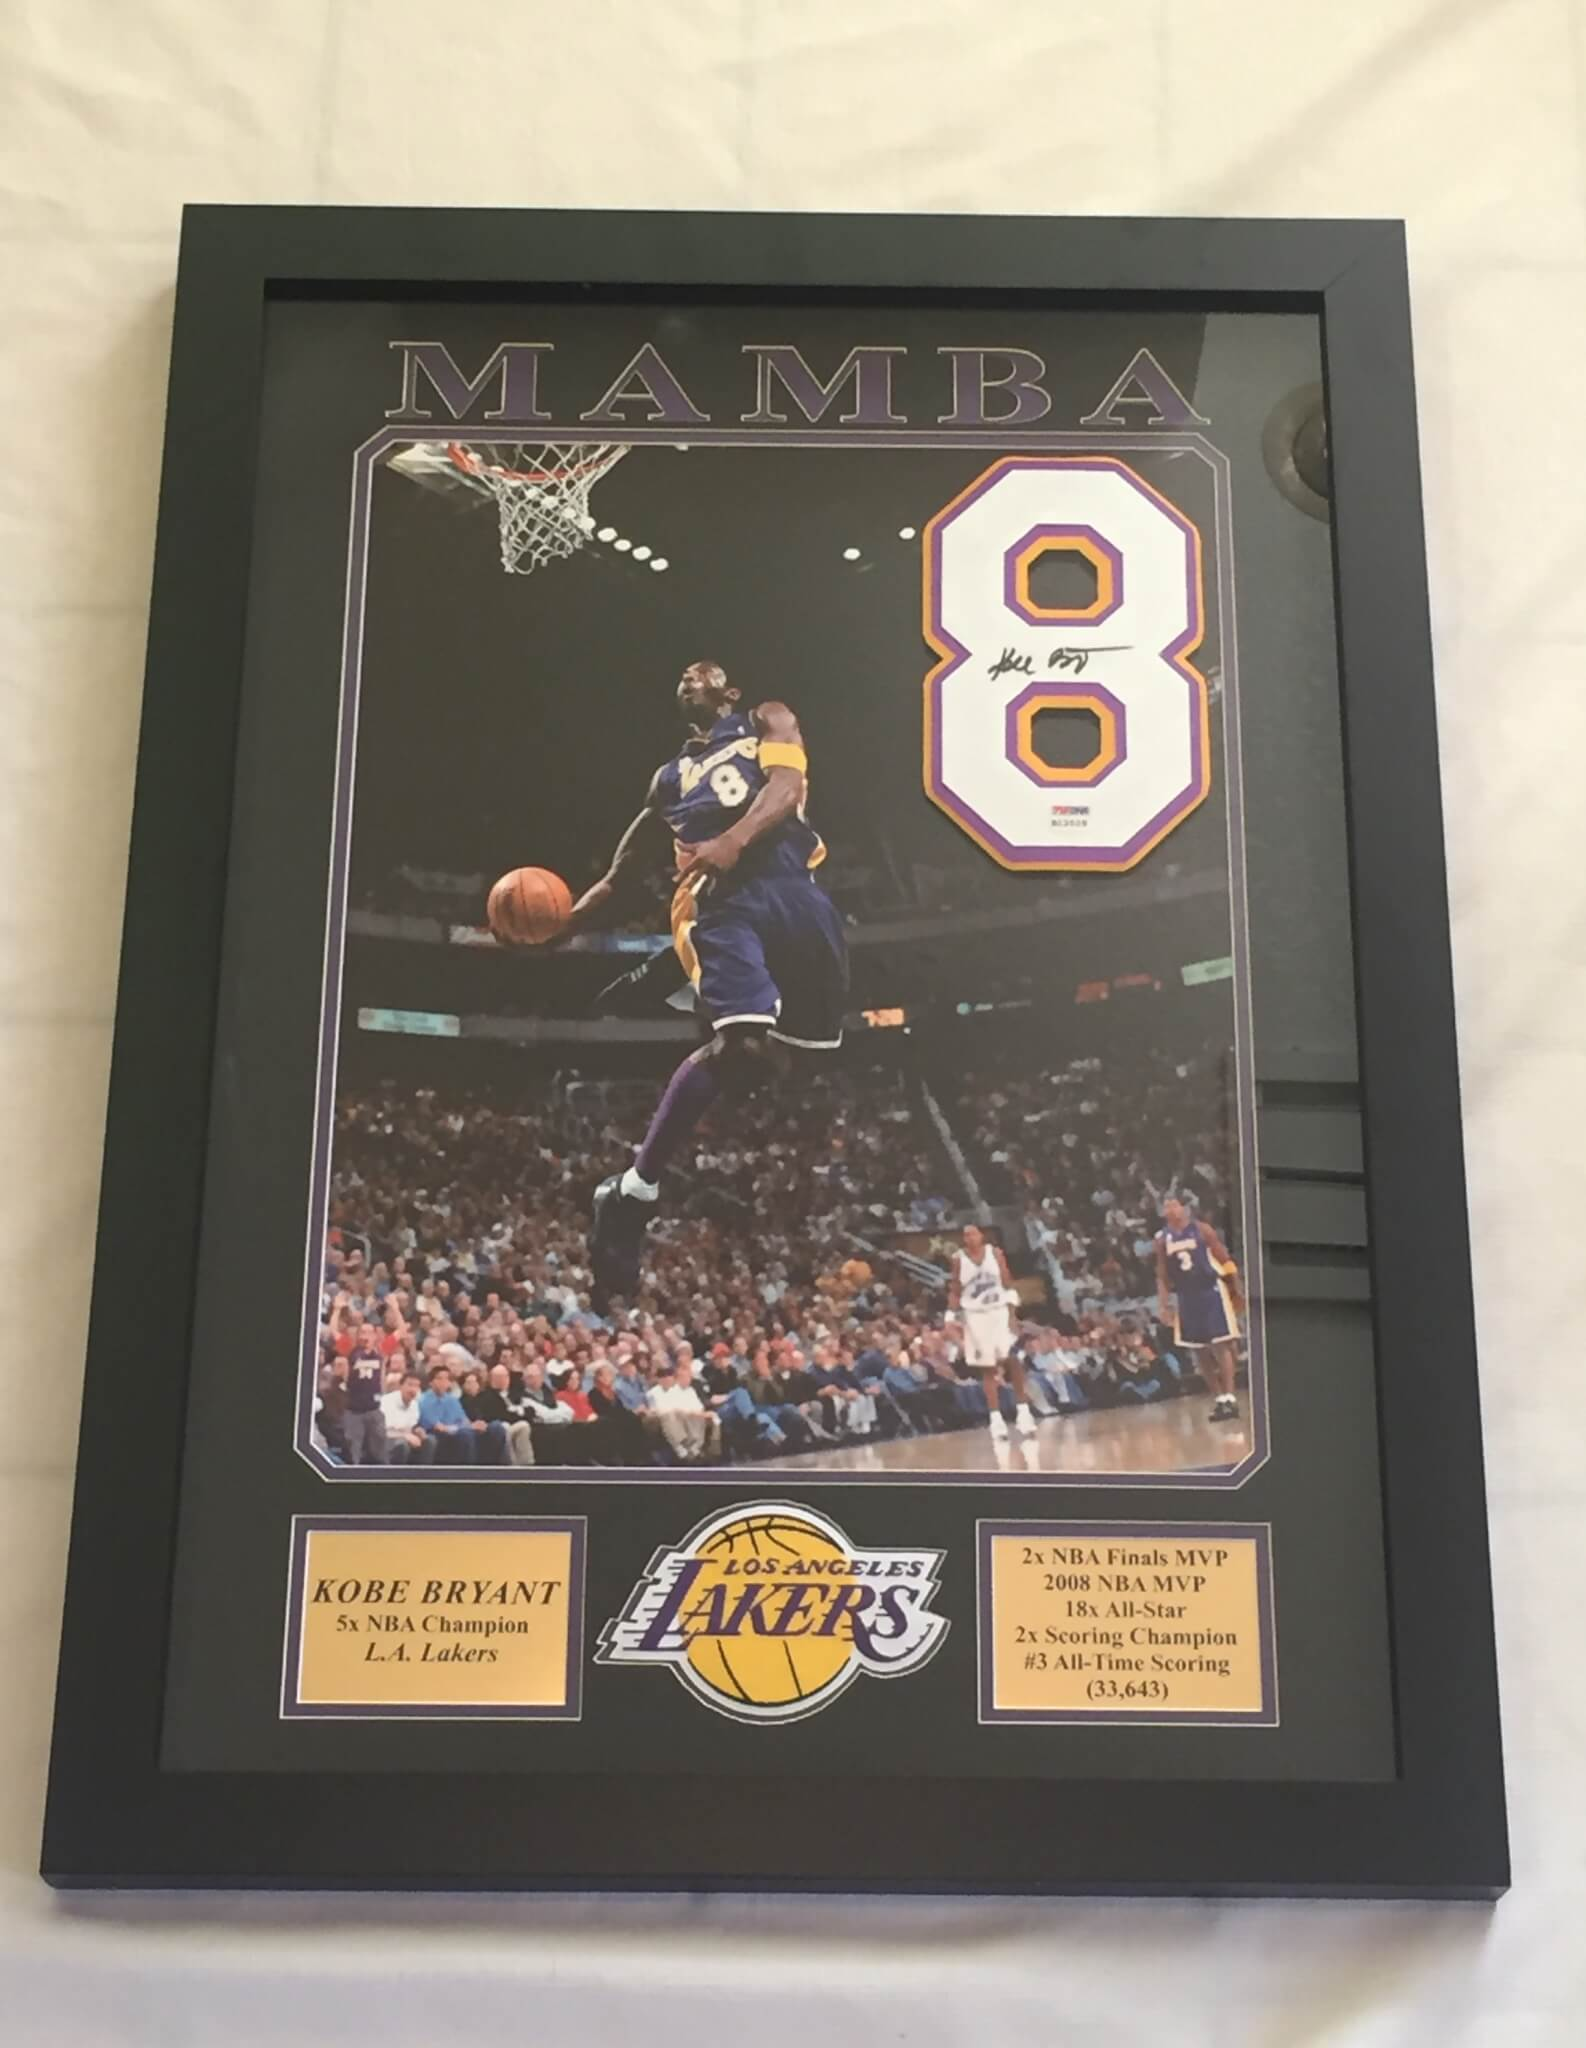 Kobe Bryant Signed Jersey #8 Full Signature PSA